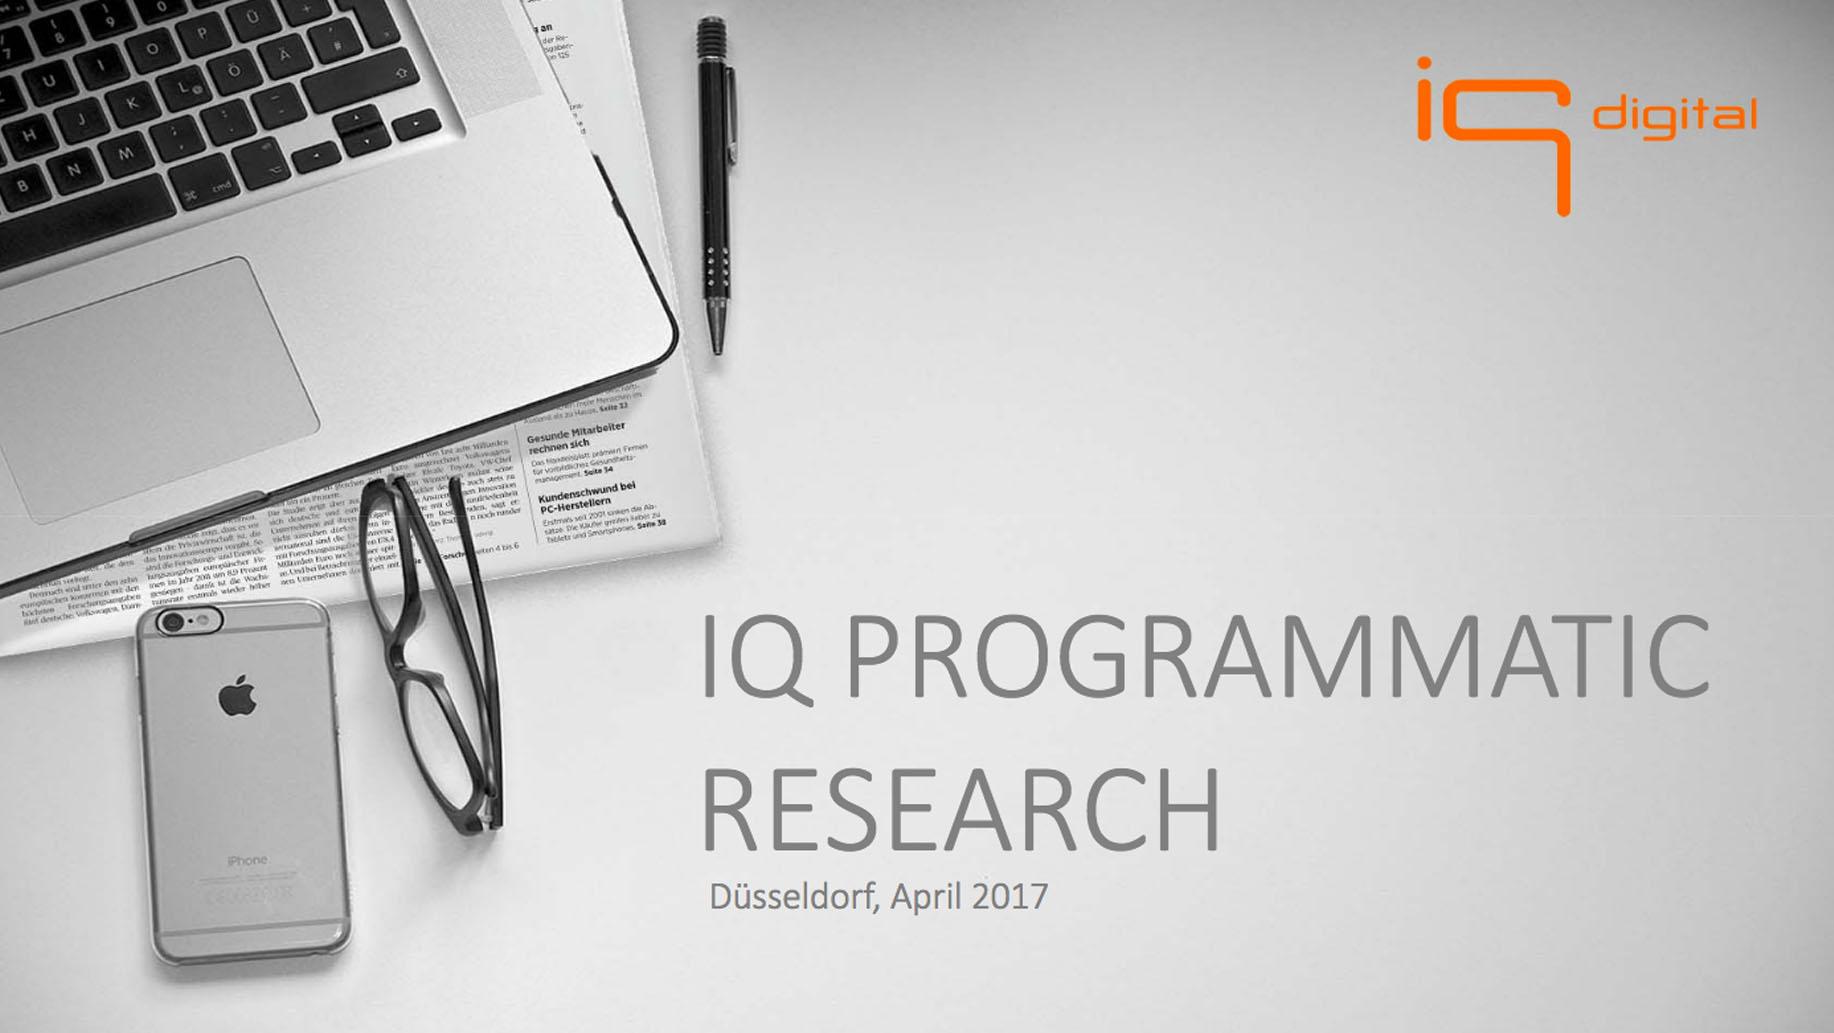 iq-programmatic-research-1